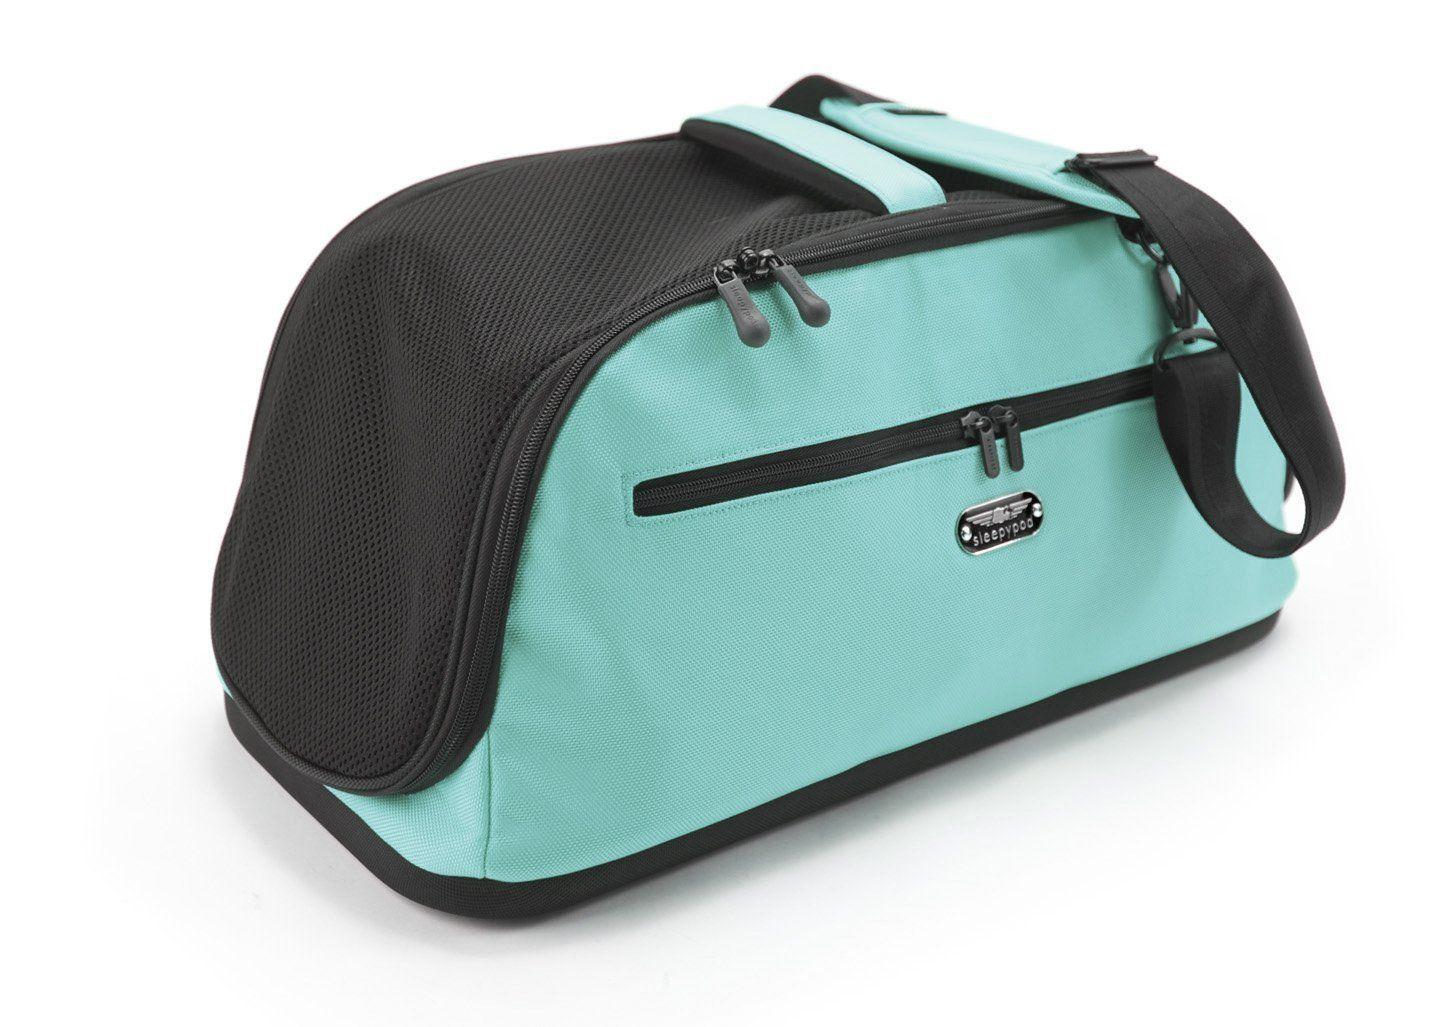 Merveilleux Amazon.com : Sleepypod Air In Cabin Pet Carrier, Jet Black : Soft